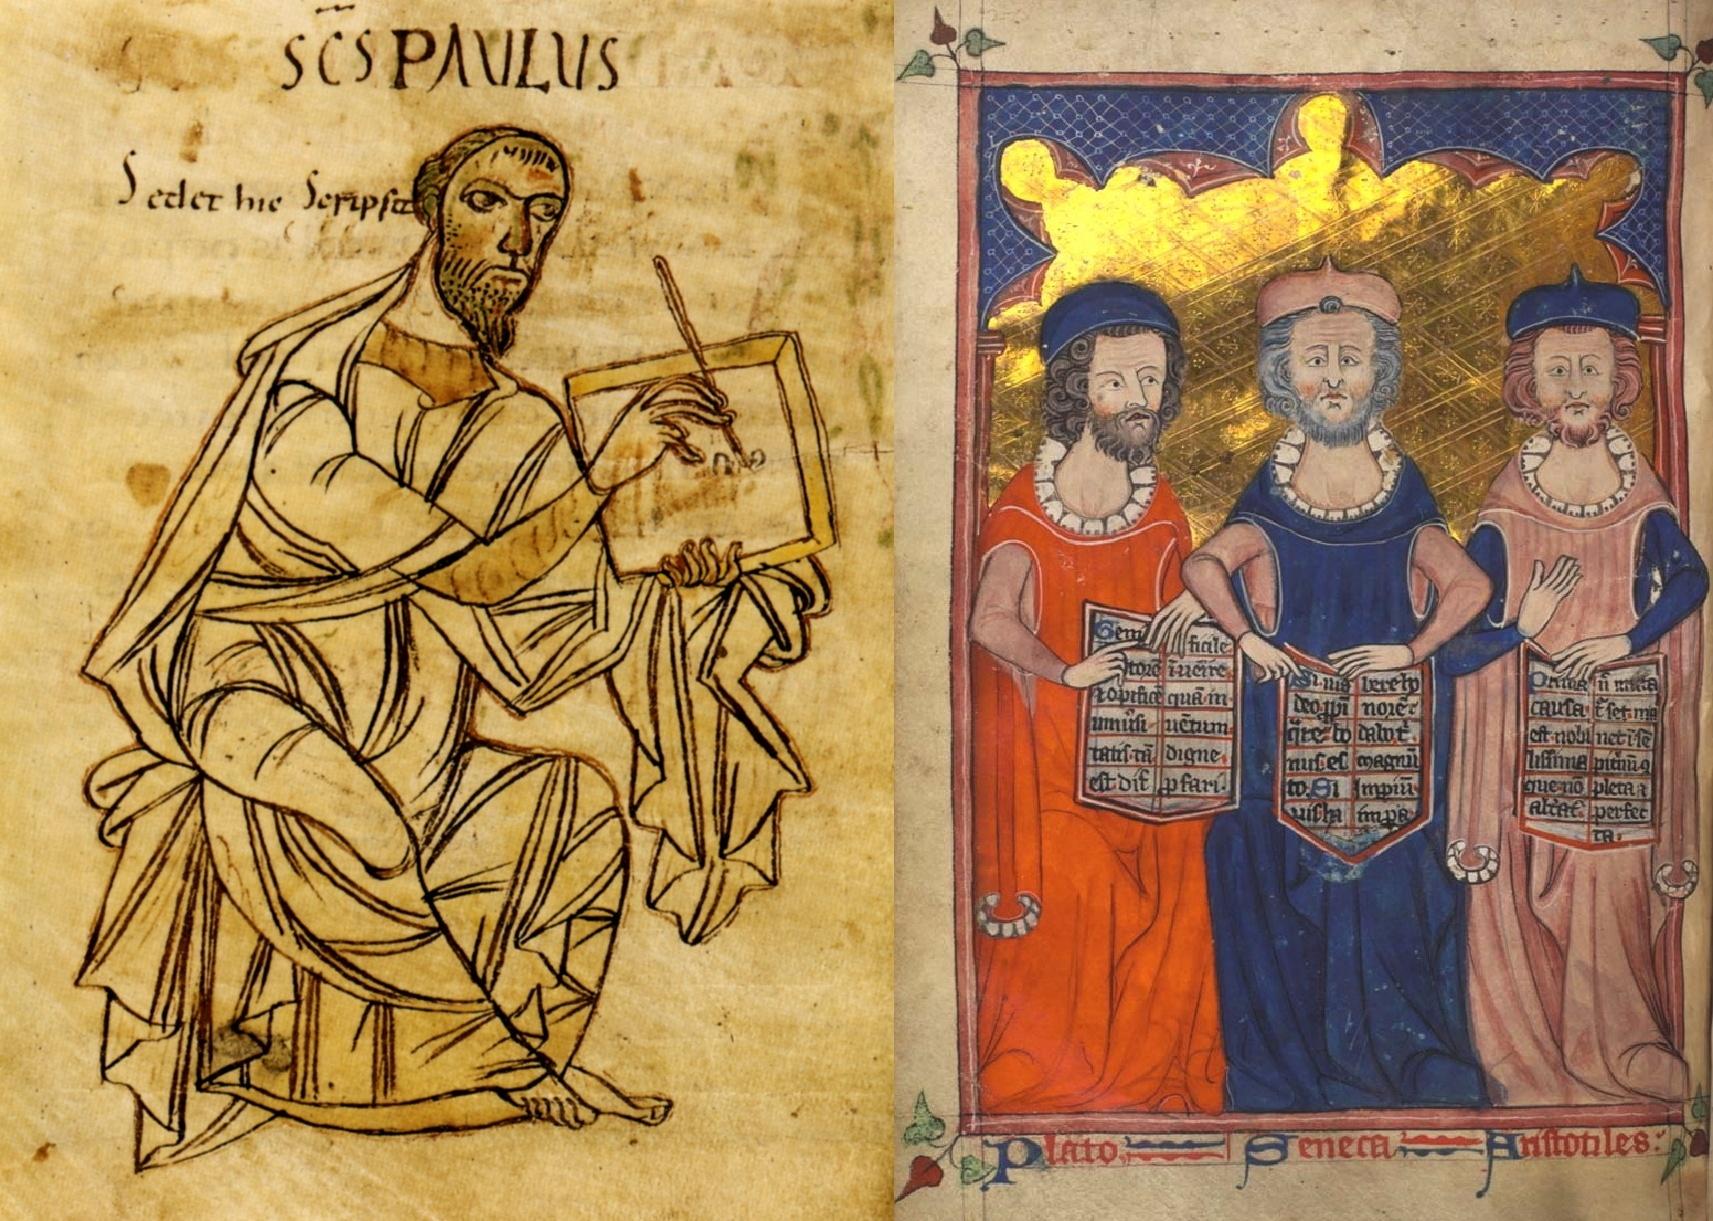 Filepaul And Seneca With Plato And Aristotlejpg